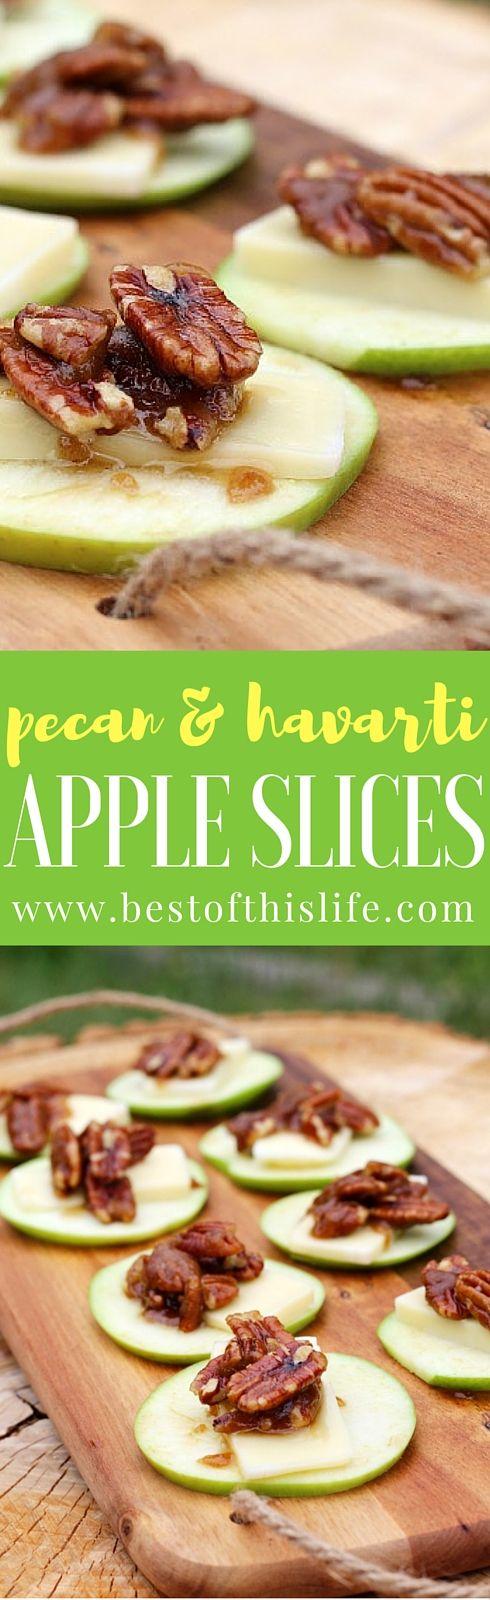 Pecan and Havarti Apple Slices Healthy Snack or Appetizer @sheblogsmedia